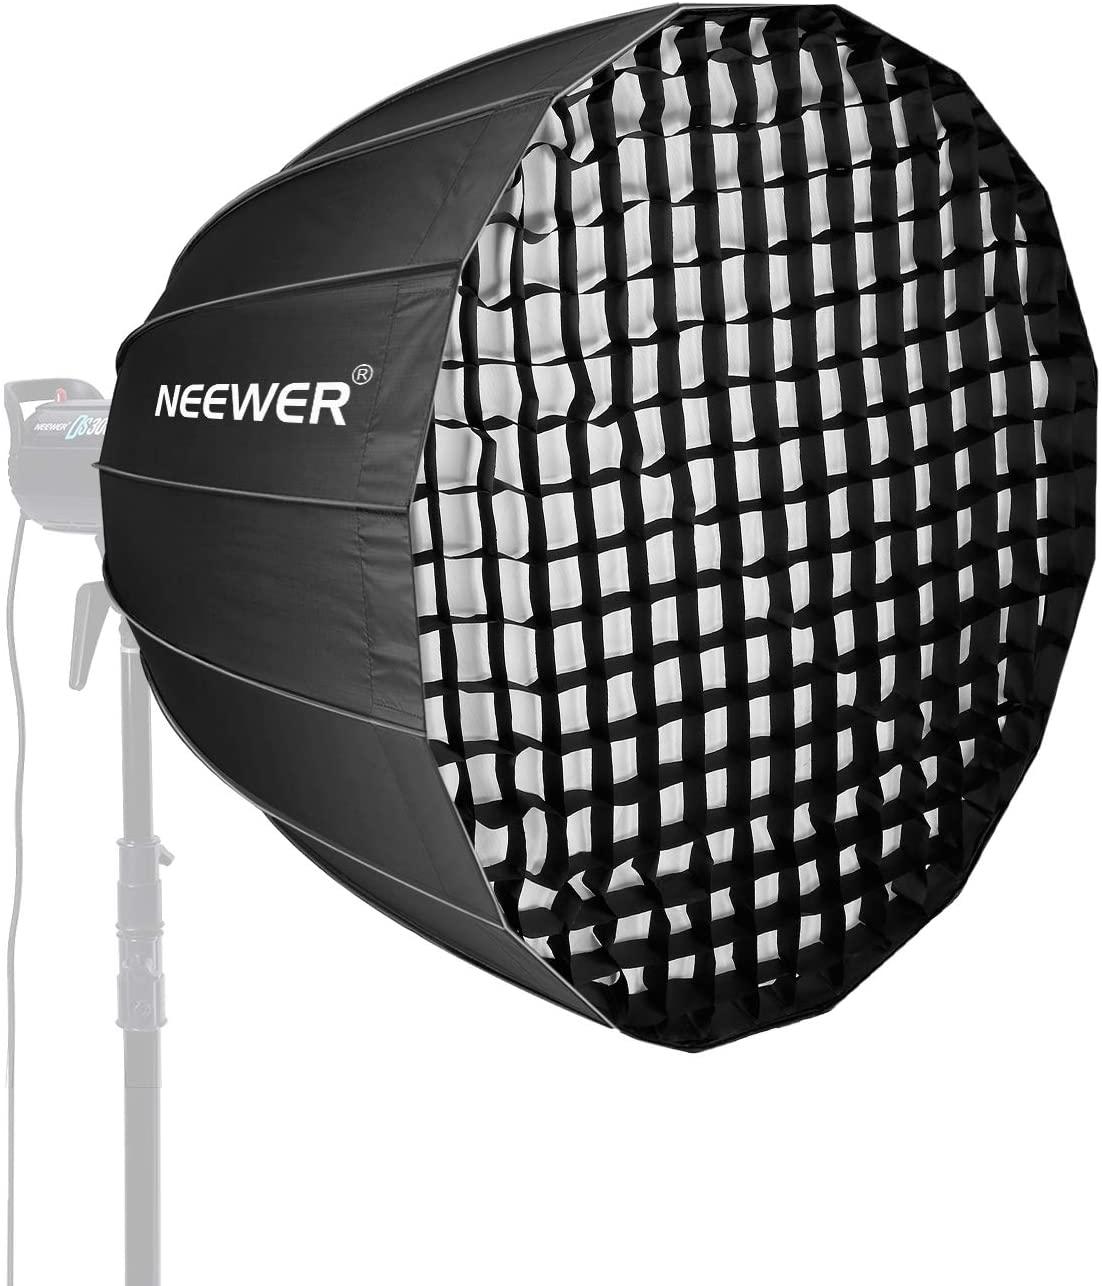 Neewer 122cm Deep Parabolic Softbox (Bowens) Image